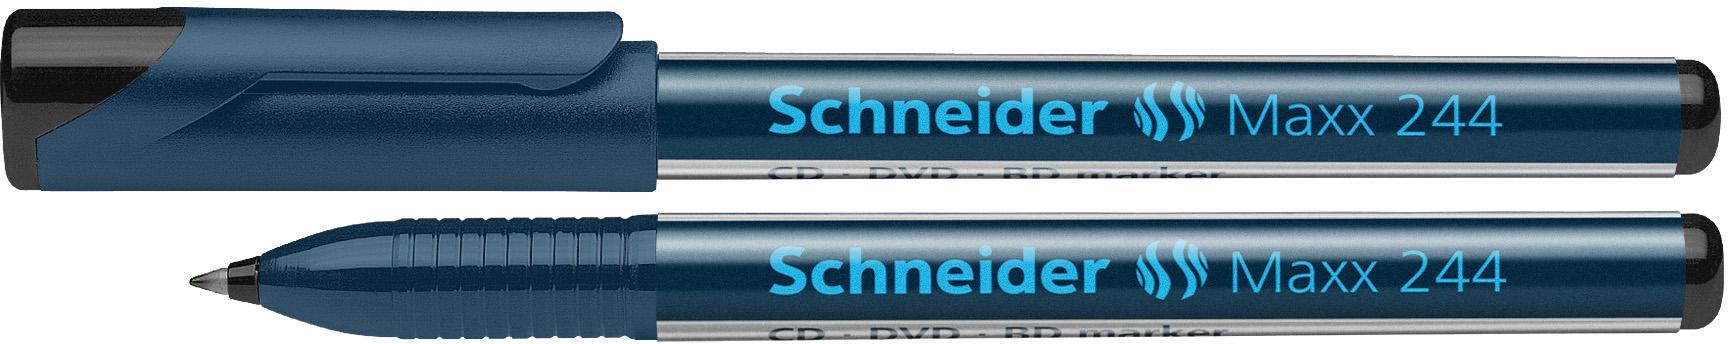 Schneider CD / DVD Marker 10 stuks zwart